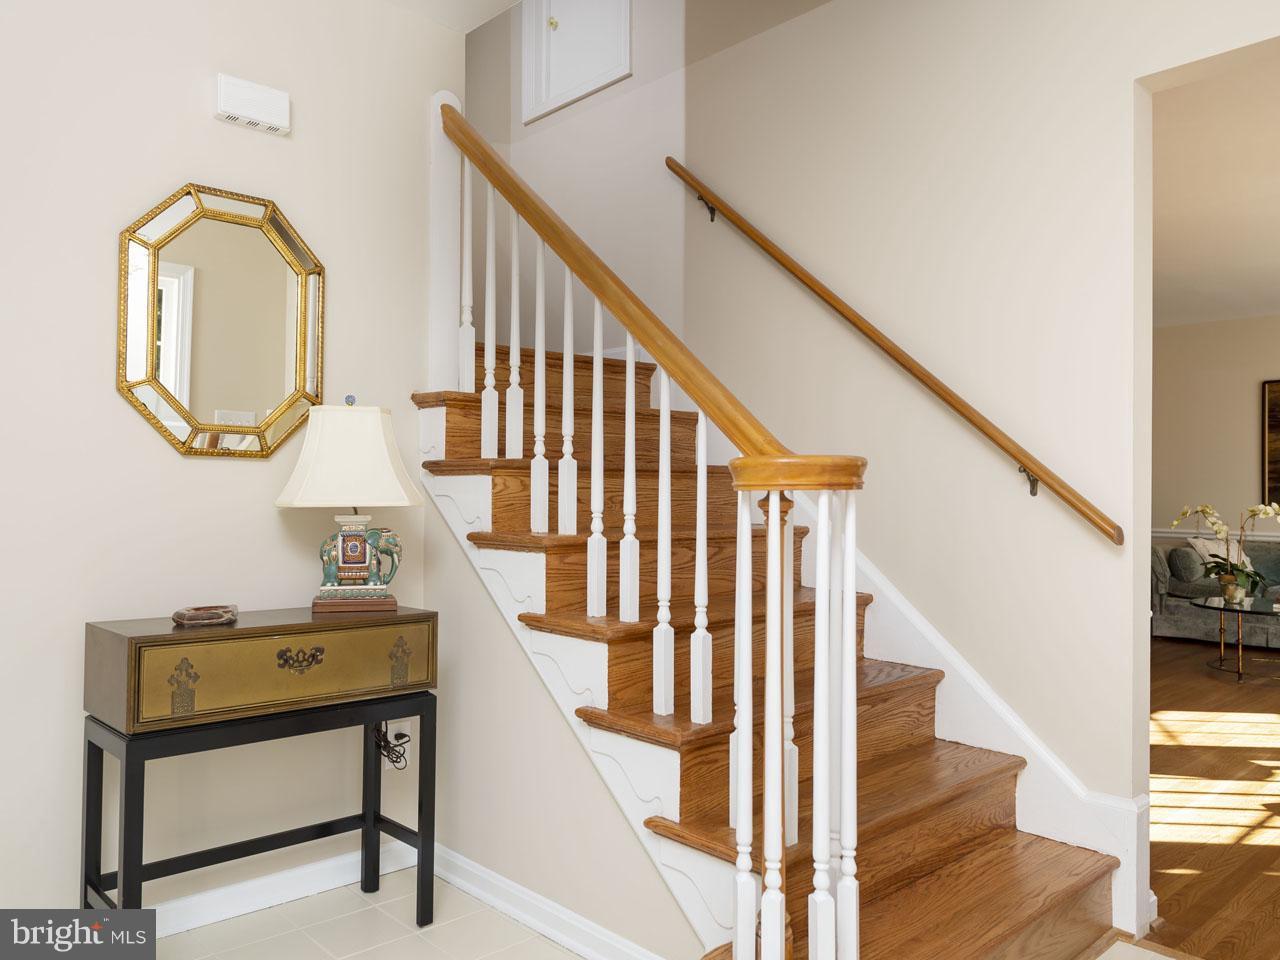 1010014728-300953036180-2021-09-05-13-50-25  |   | Annandale Delaware Real Estate For Sale | MLS# 1010014728  - Best of Northern Virginia